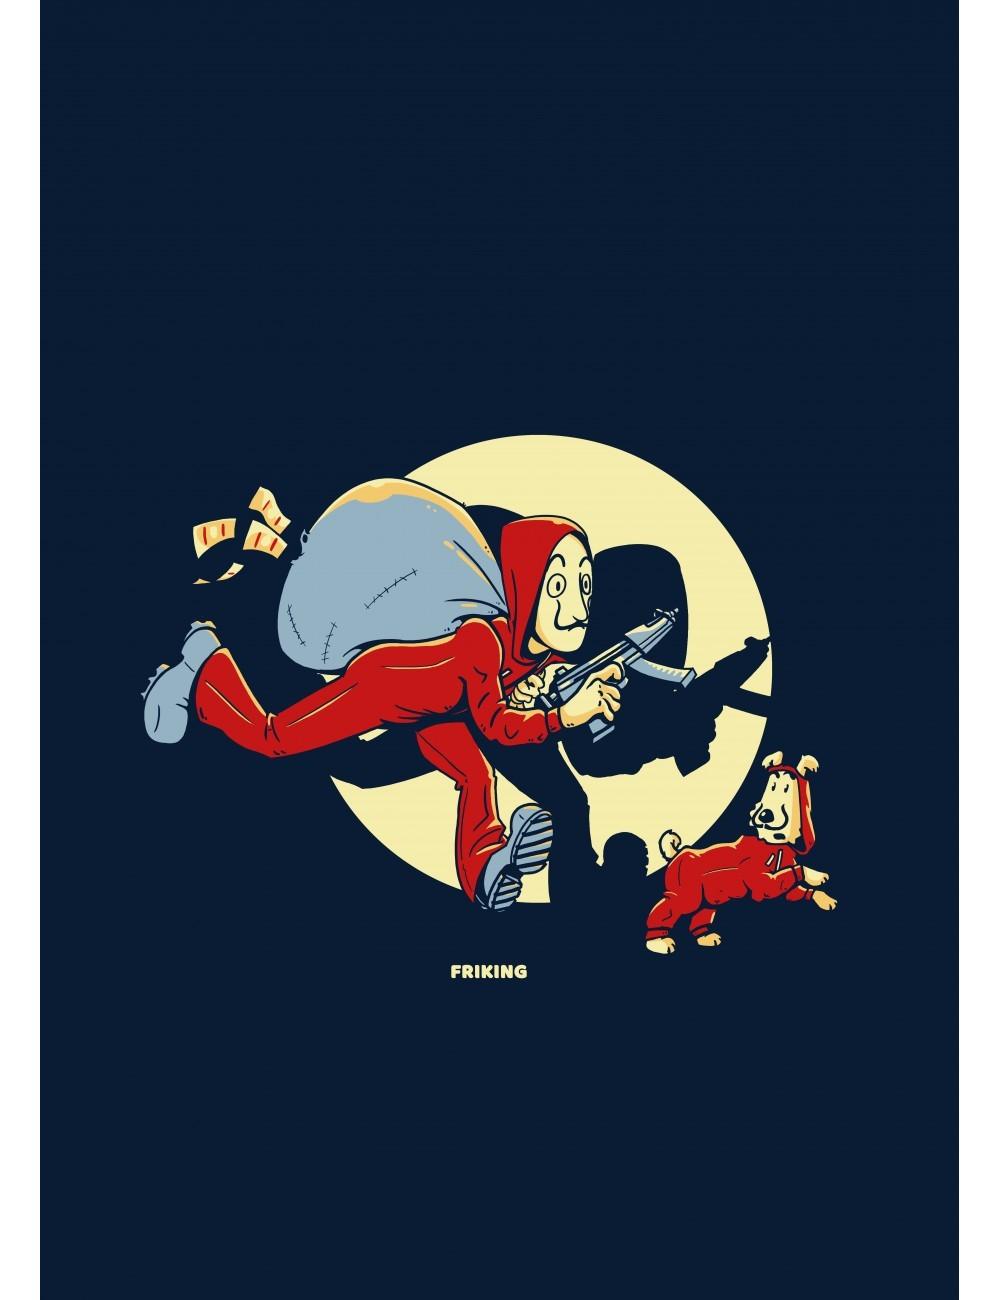 Comic thief